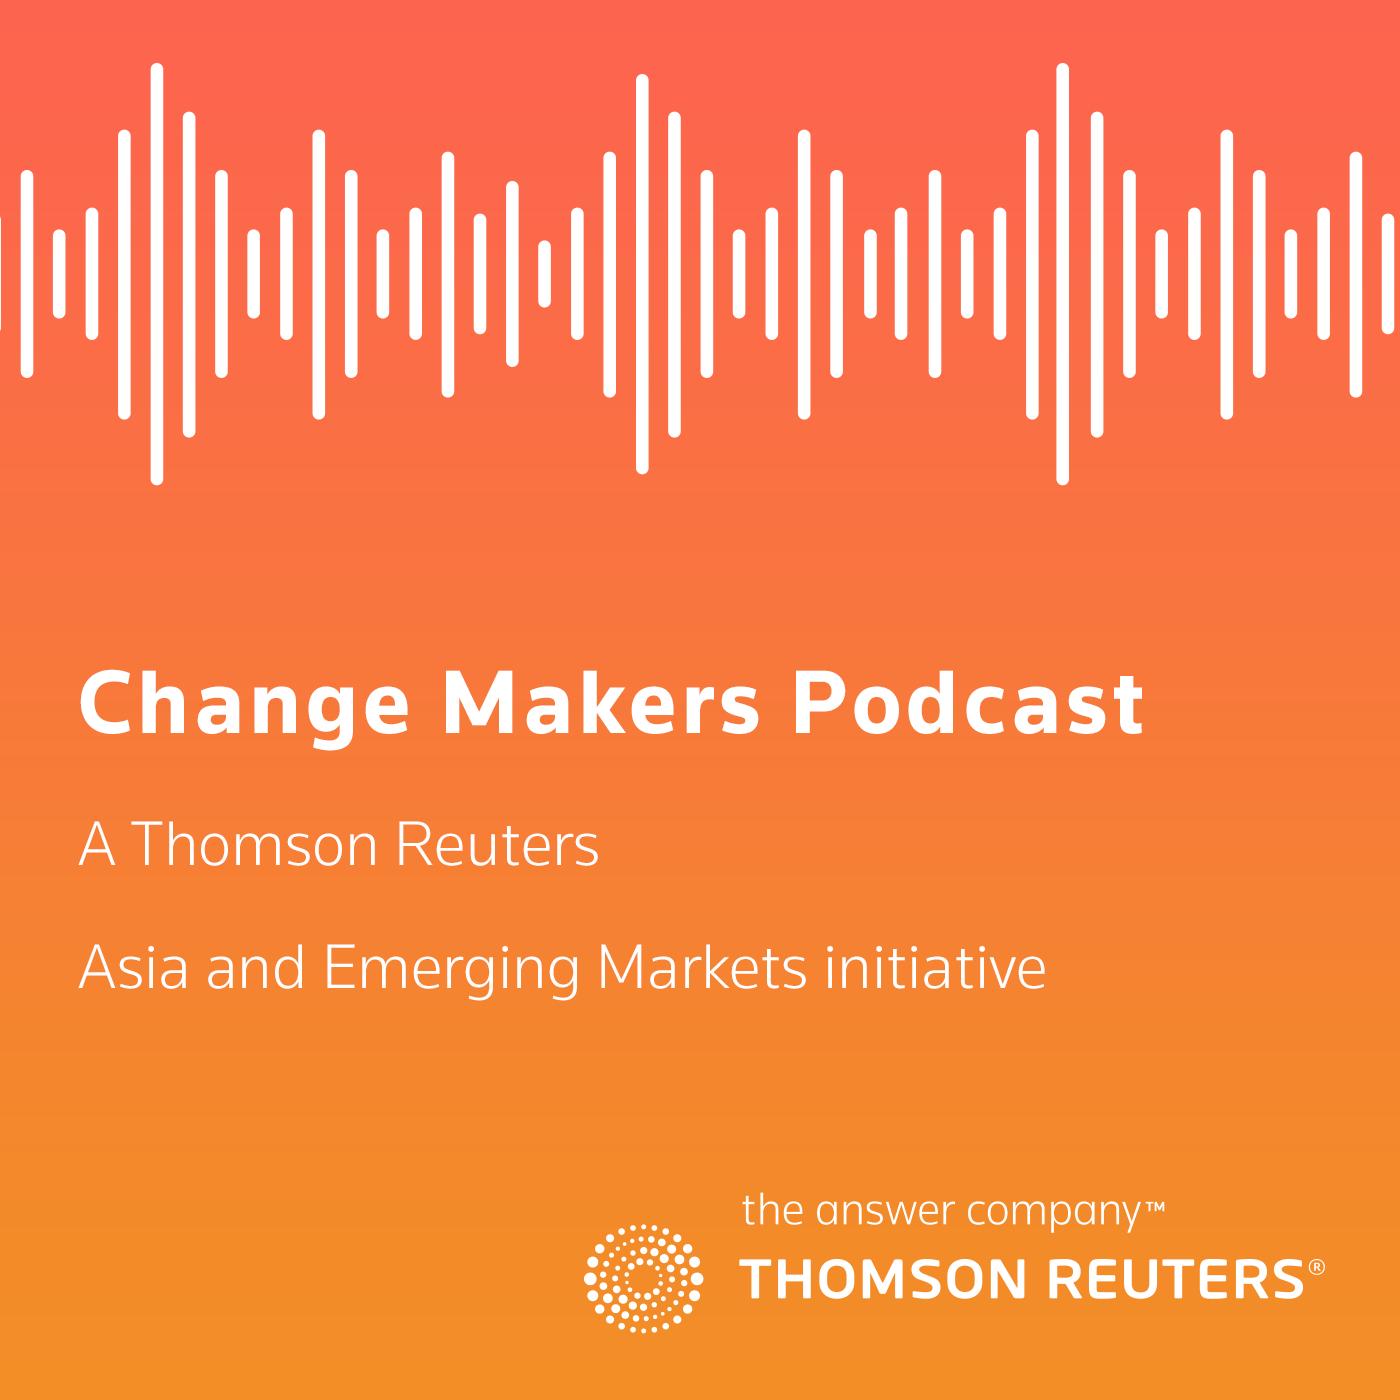 Artwork for podcast Change Makers Podcast